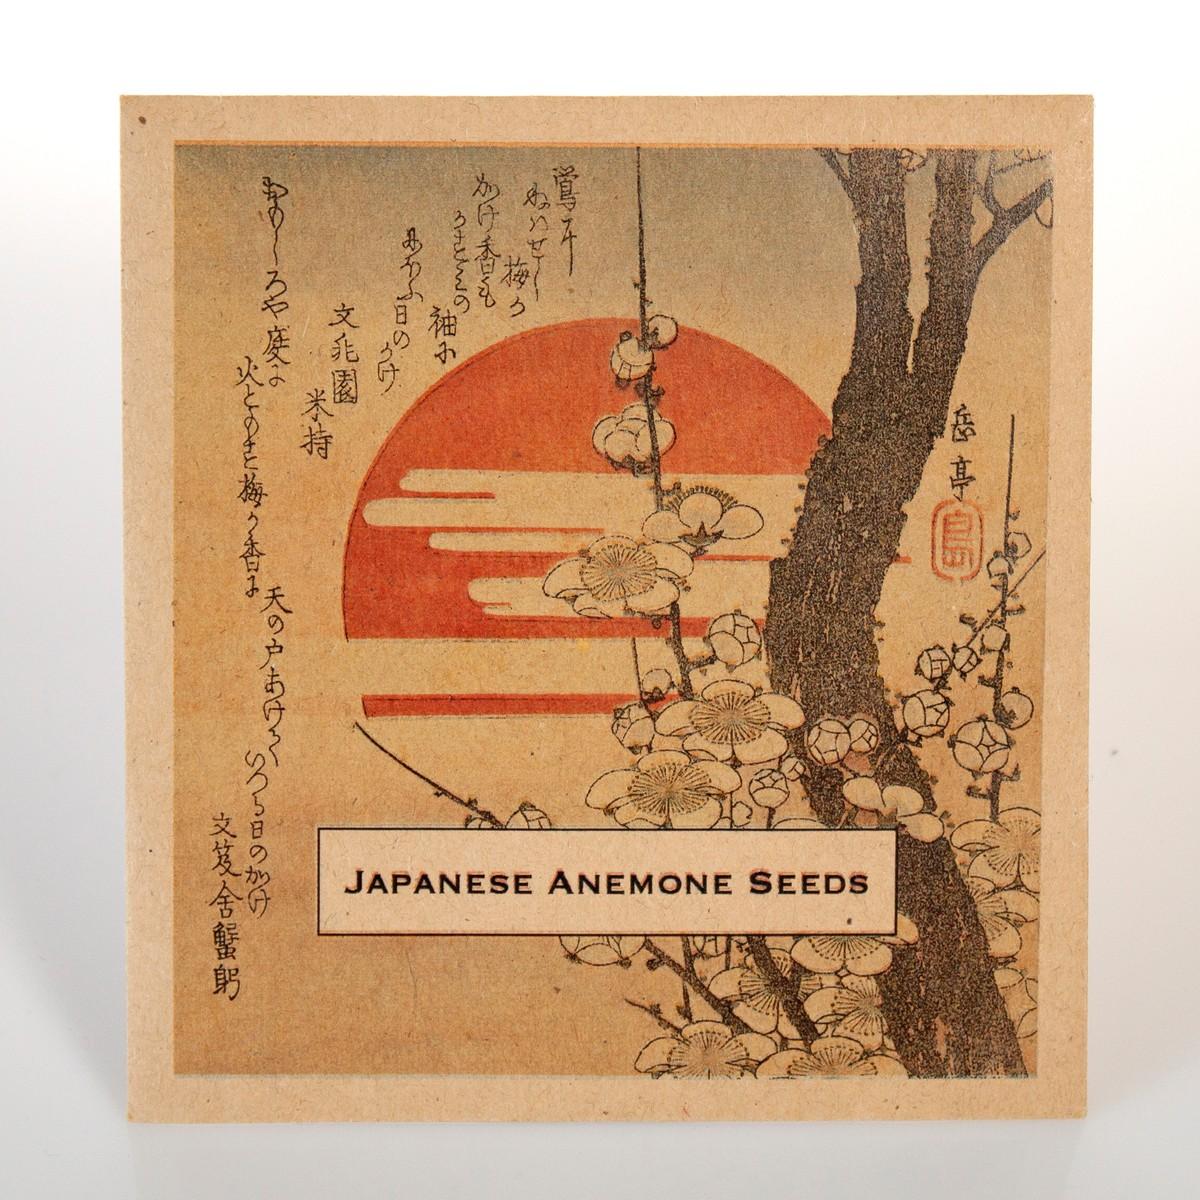 Photo of Japanese Anemone Seeds